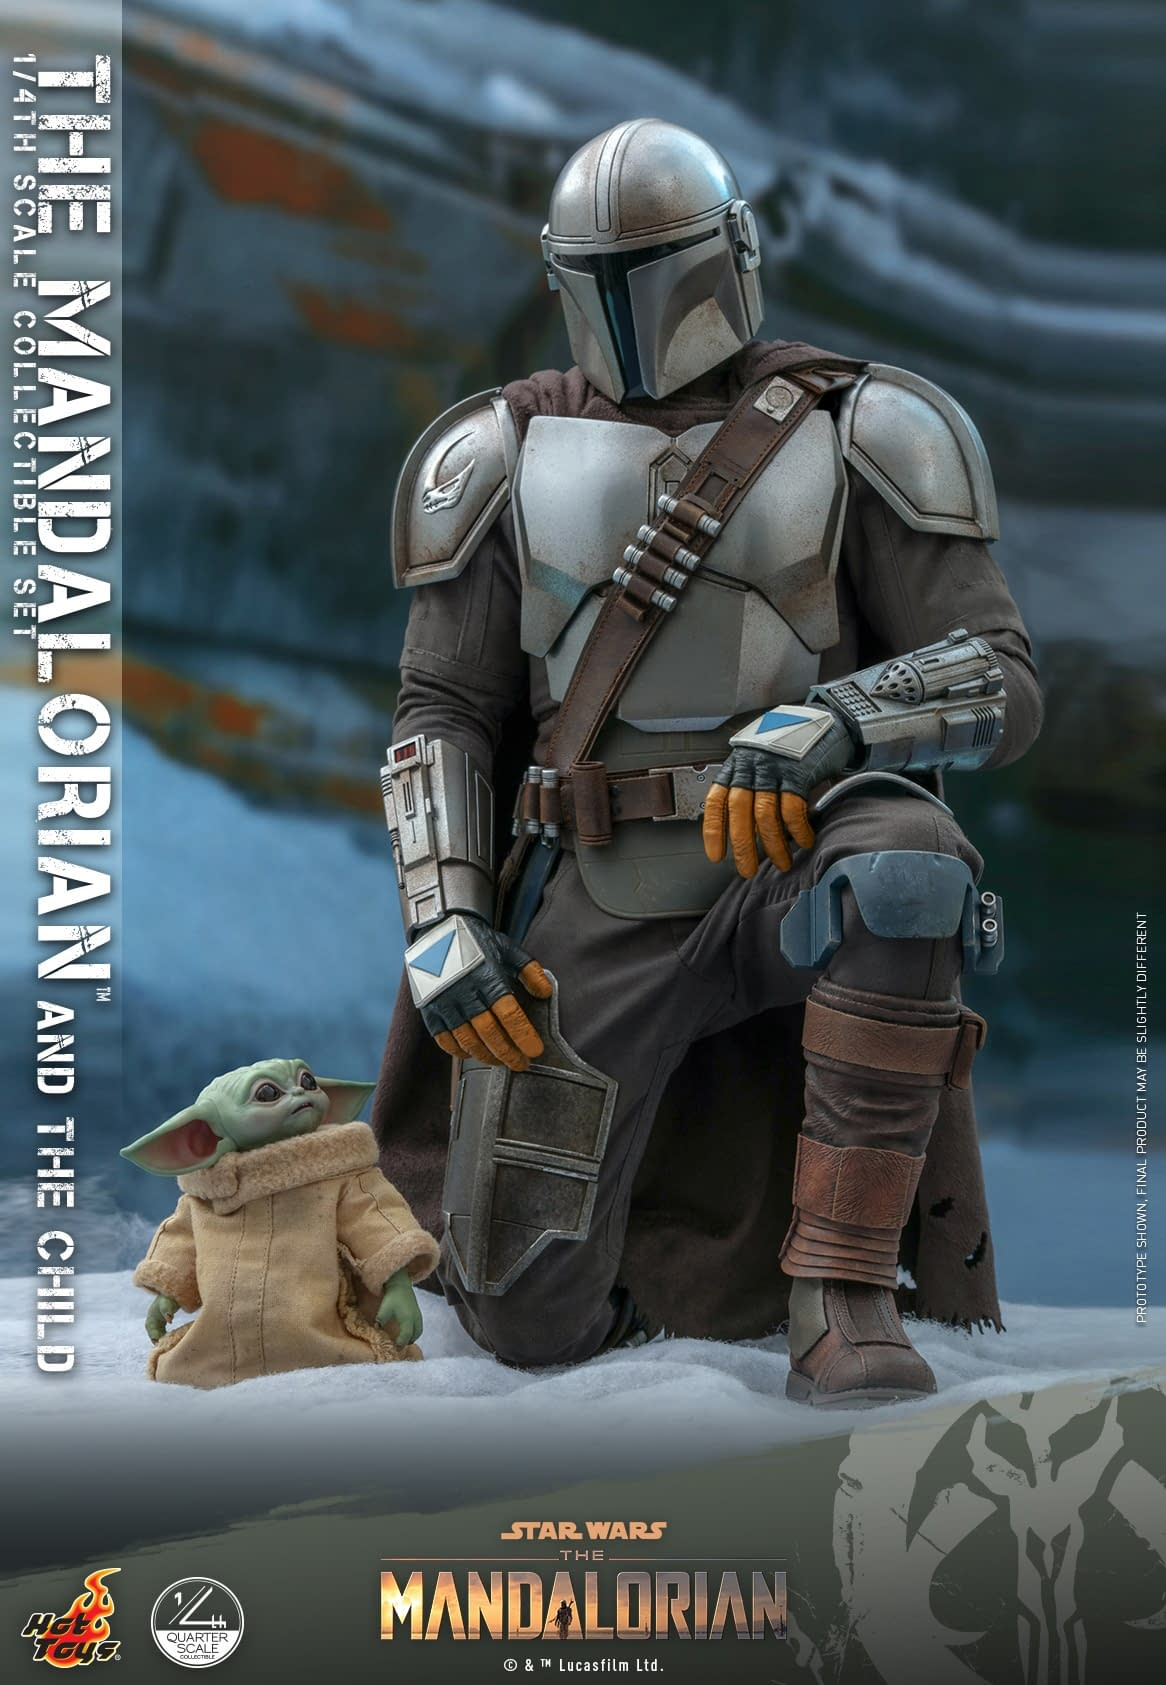 Hot Toys Announces 1  4th Scale The Mandalorian  U0026 The Child